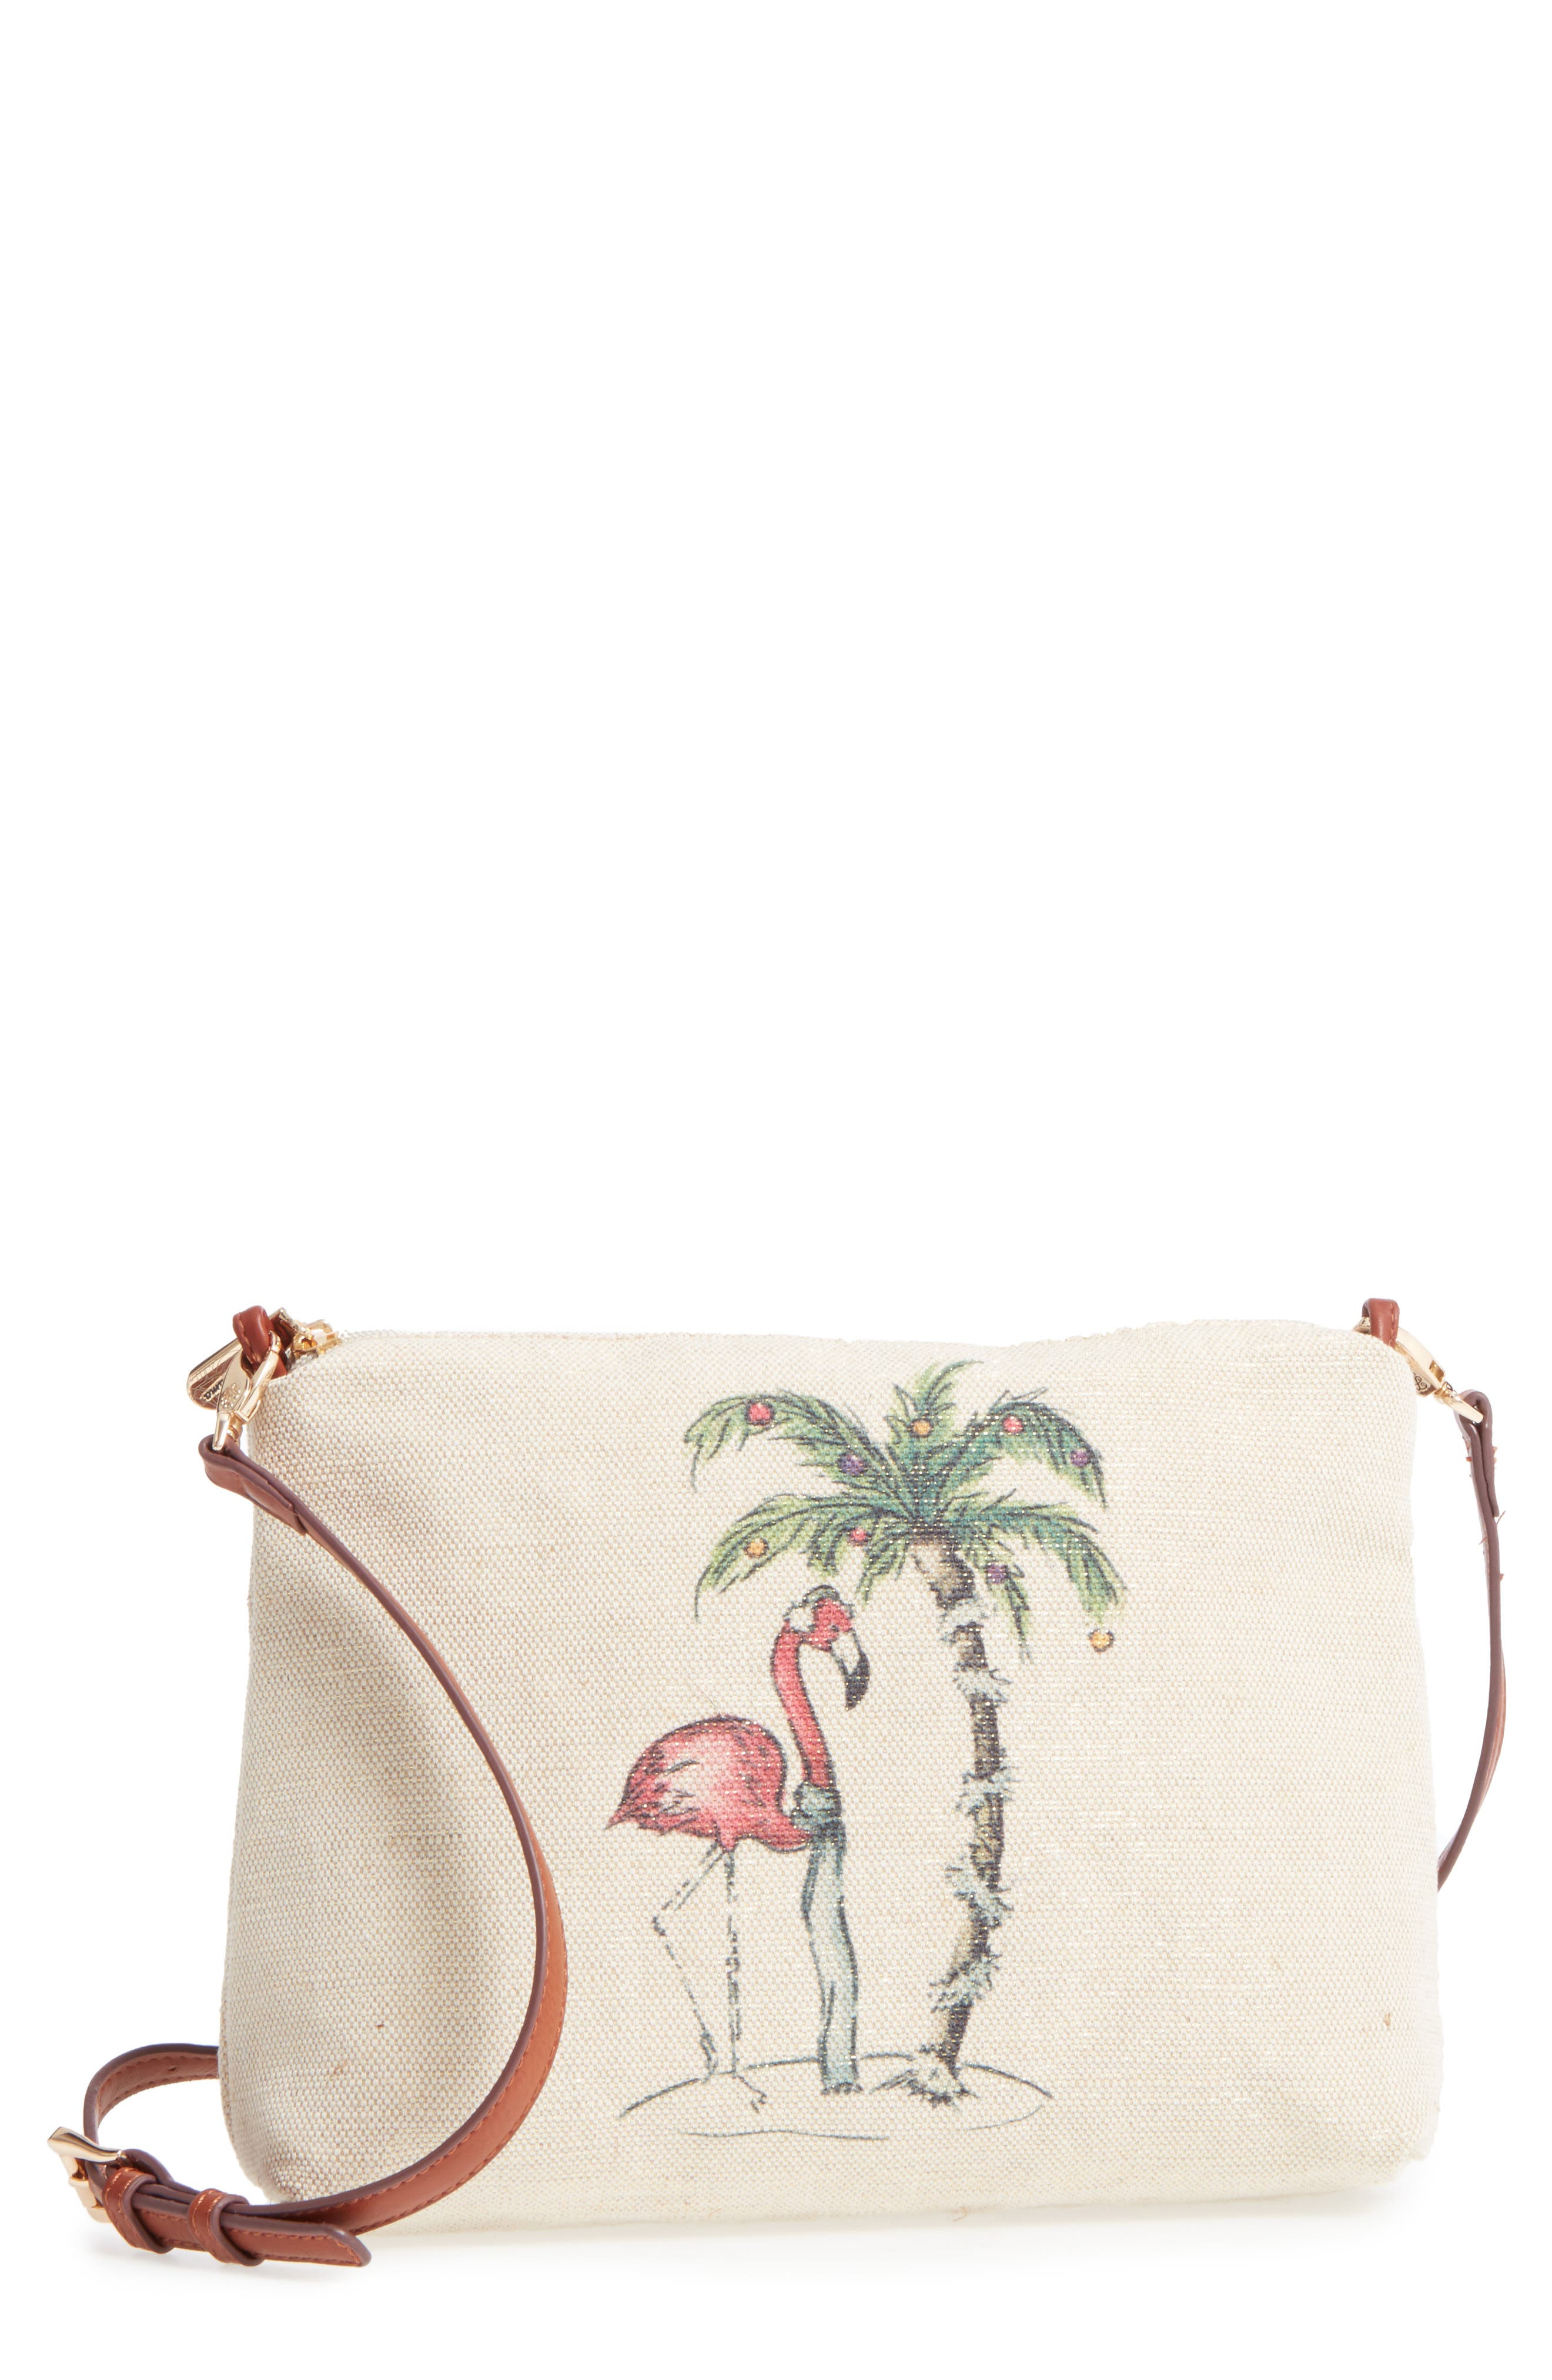 La Plancha Convertible Crossbody Bag,                             Main thumbnail 1, color,